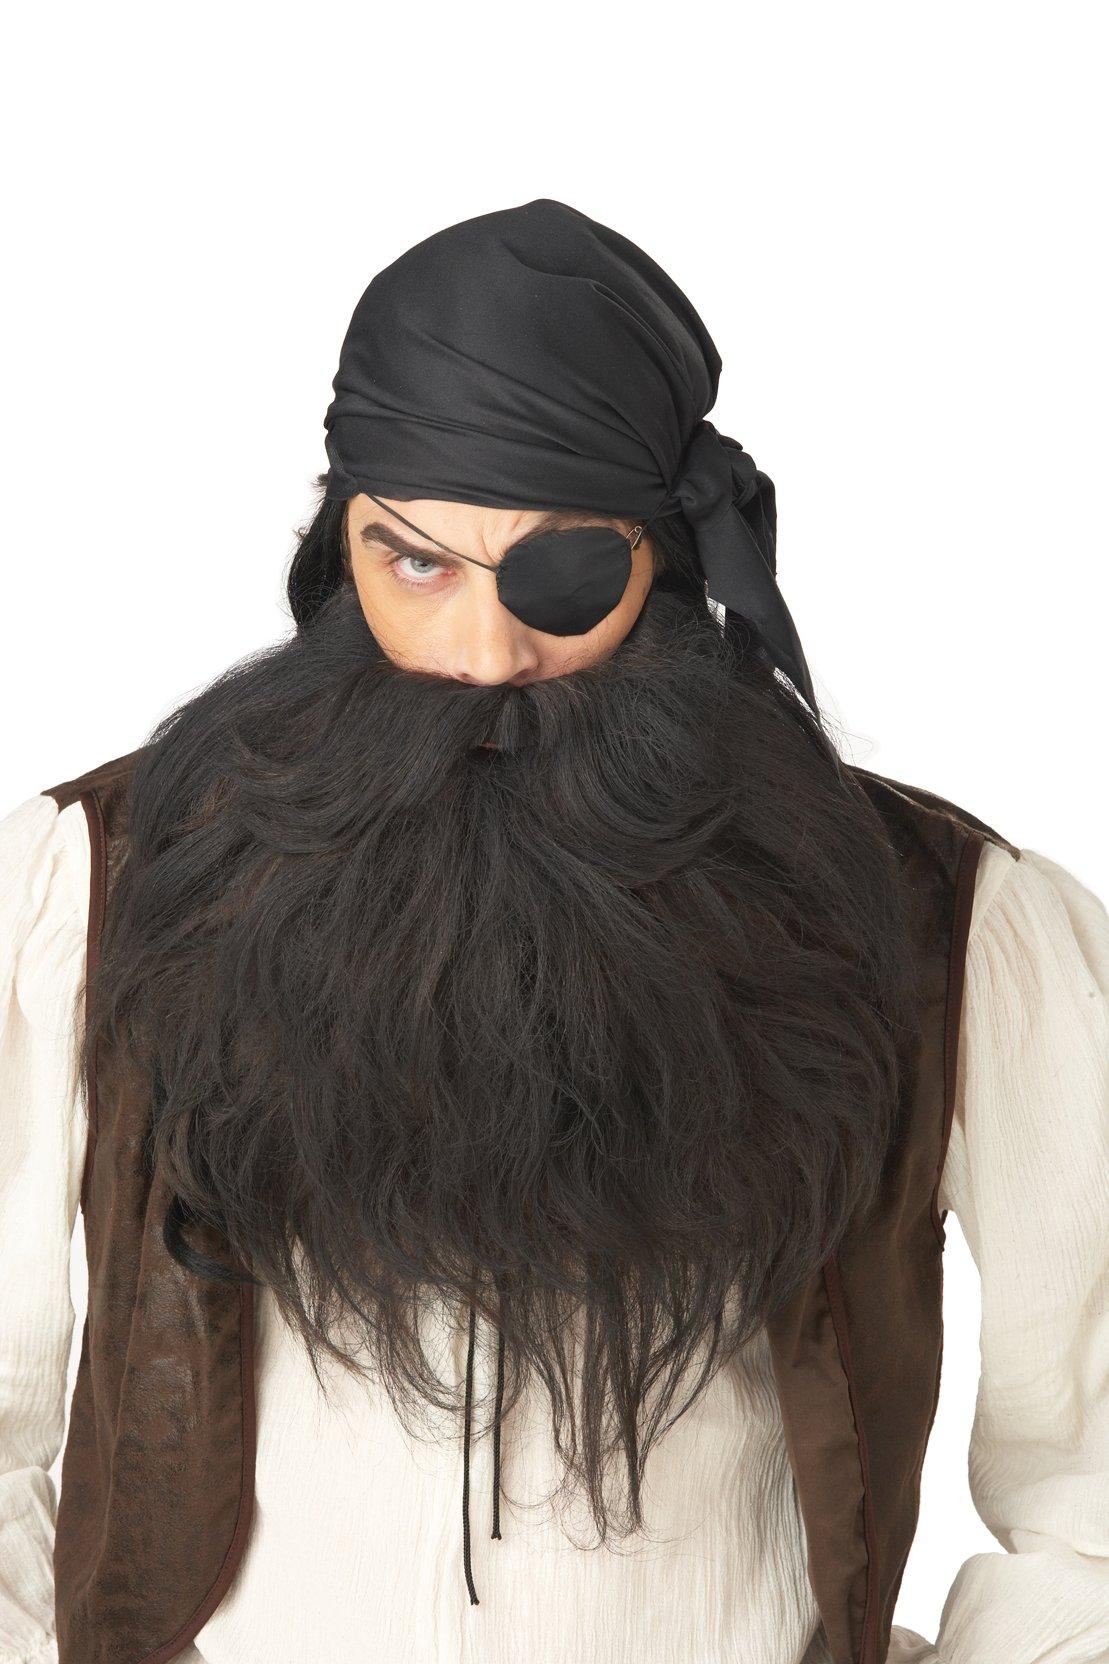 California Costumes Pirate Beard And Moustache, Black, One Size Costume Accessory